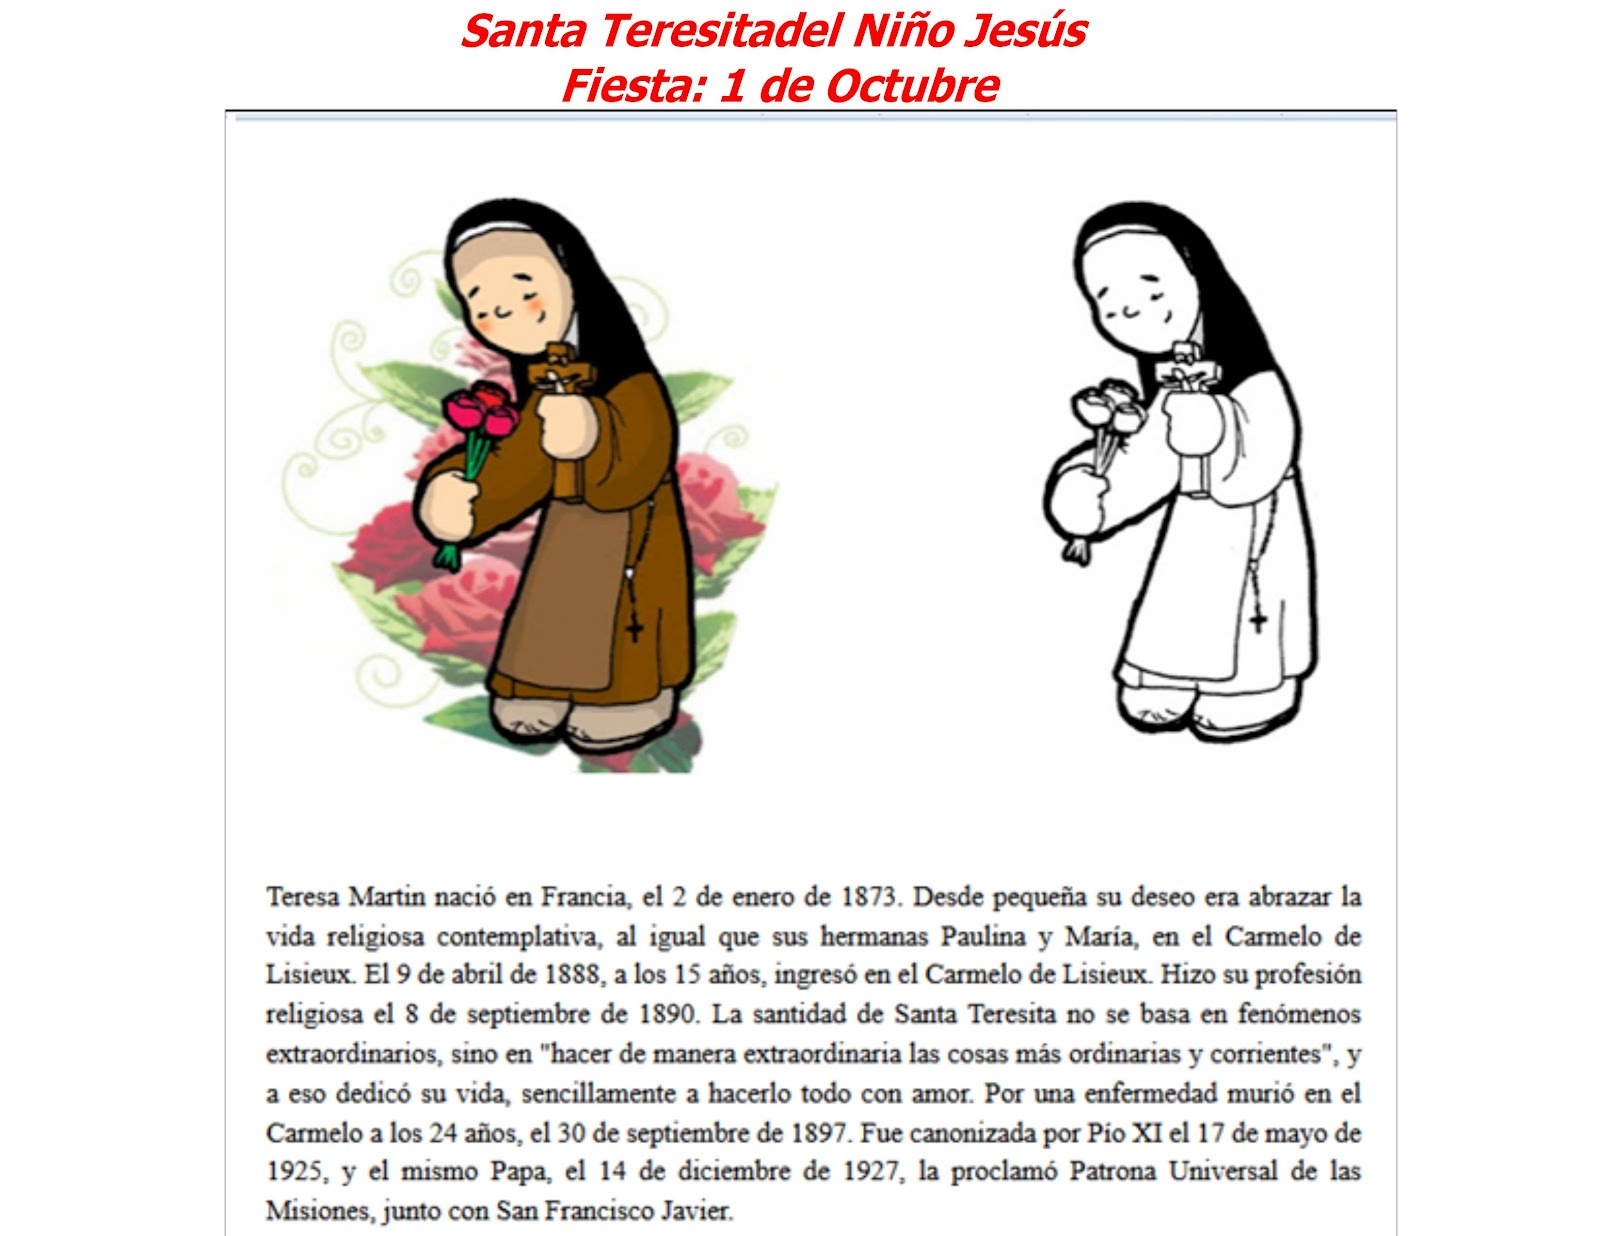 Me gusta la clase de religión: Santa Teresita del Niño Jesús